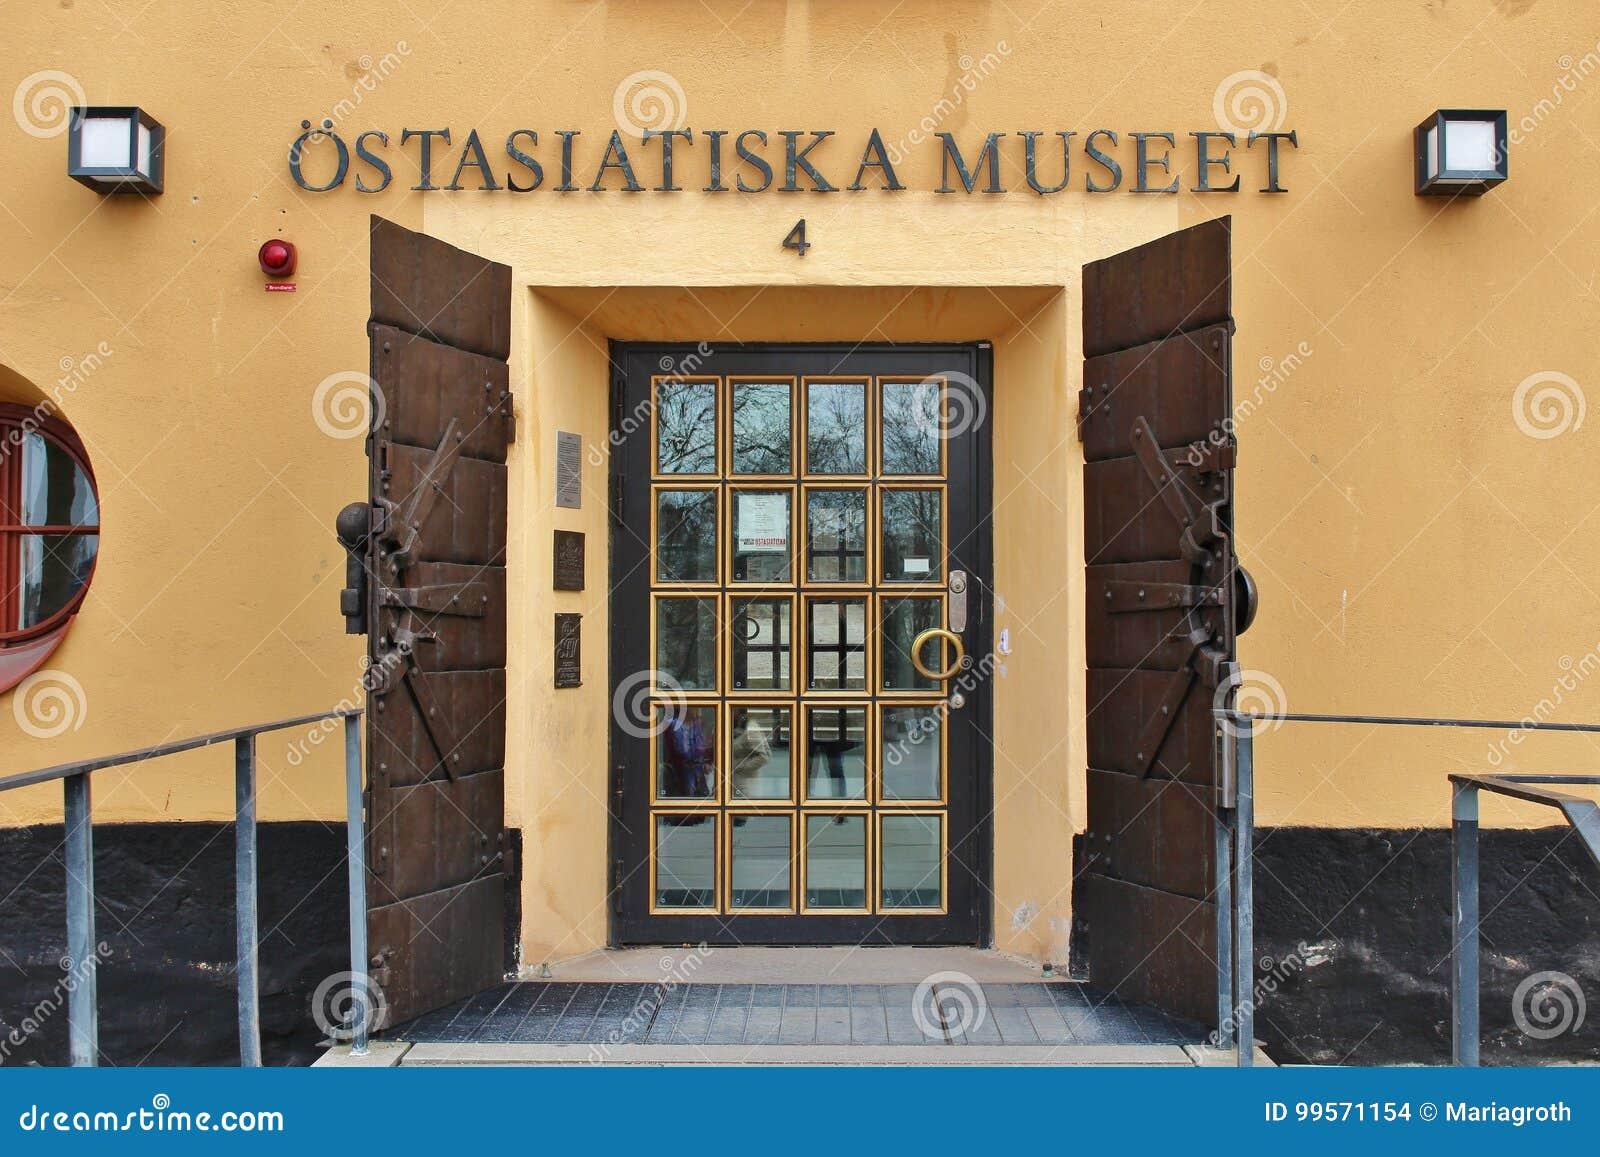 Ã-stasiatiskamuseet, Stockholm